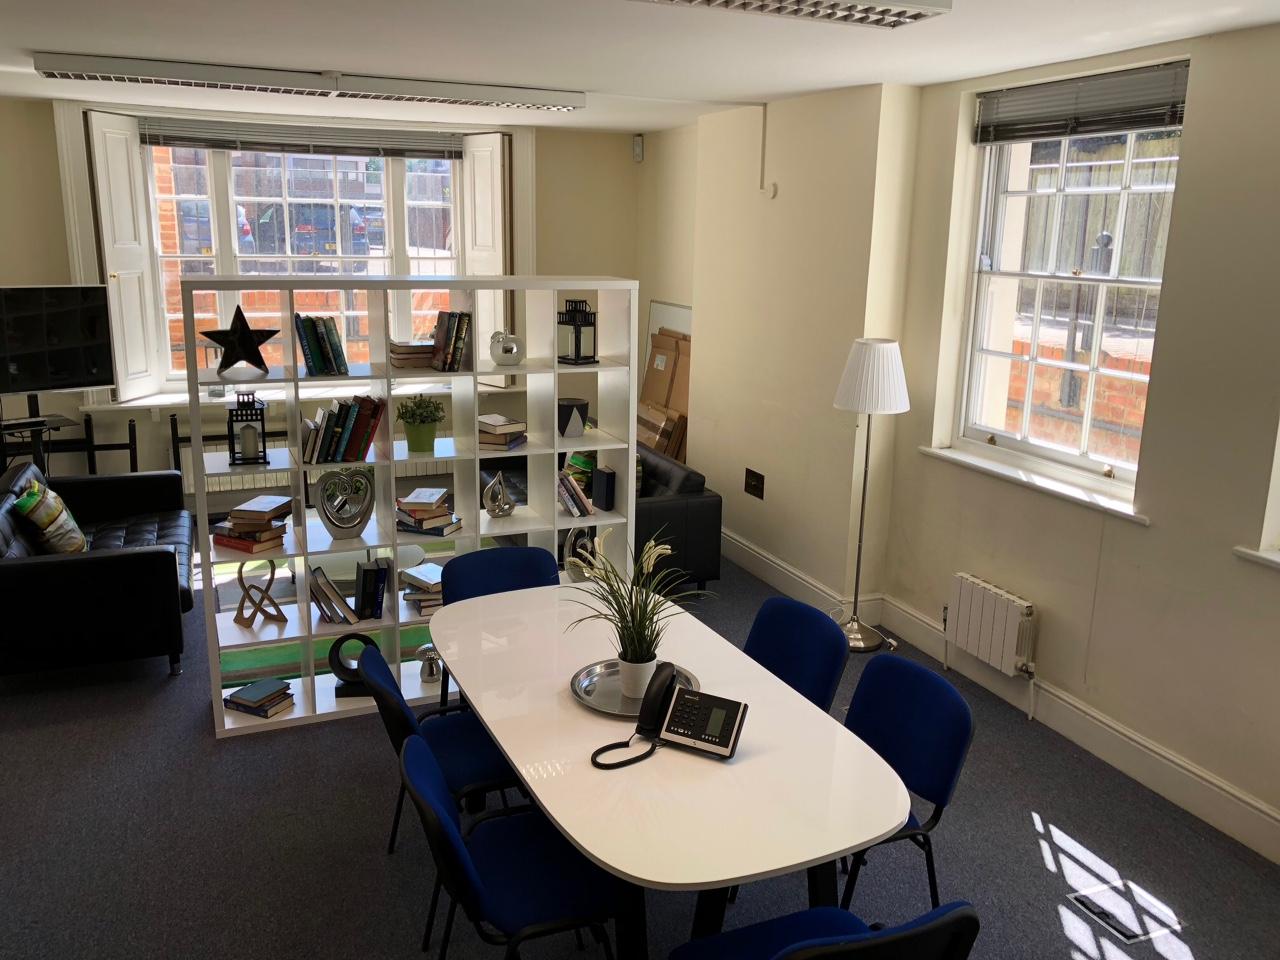 Meeting area at Markham House - The Workstation, Wokingham